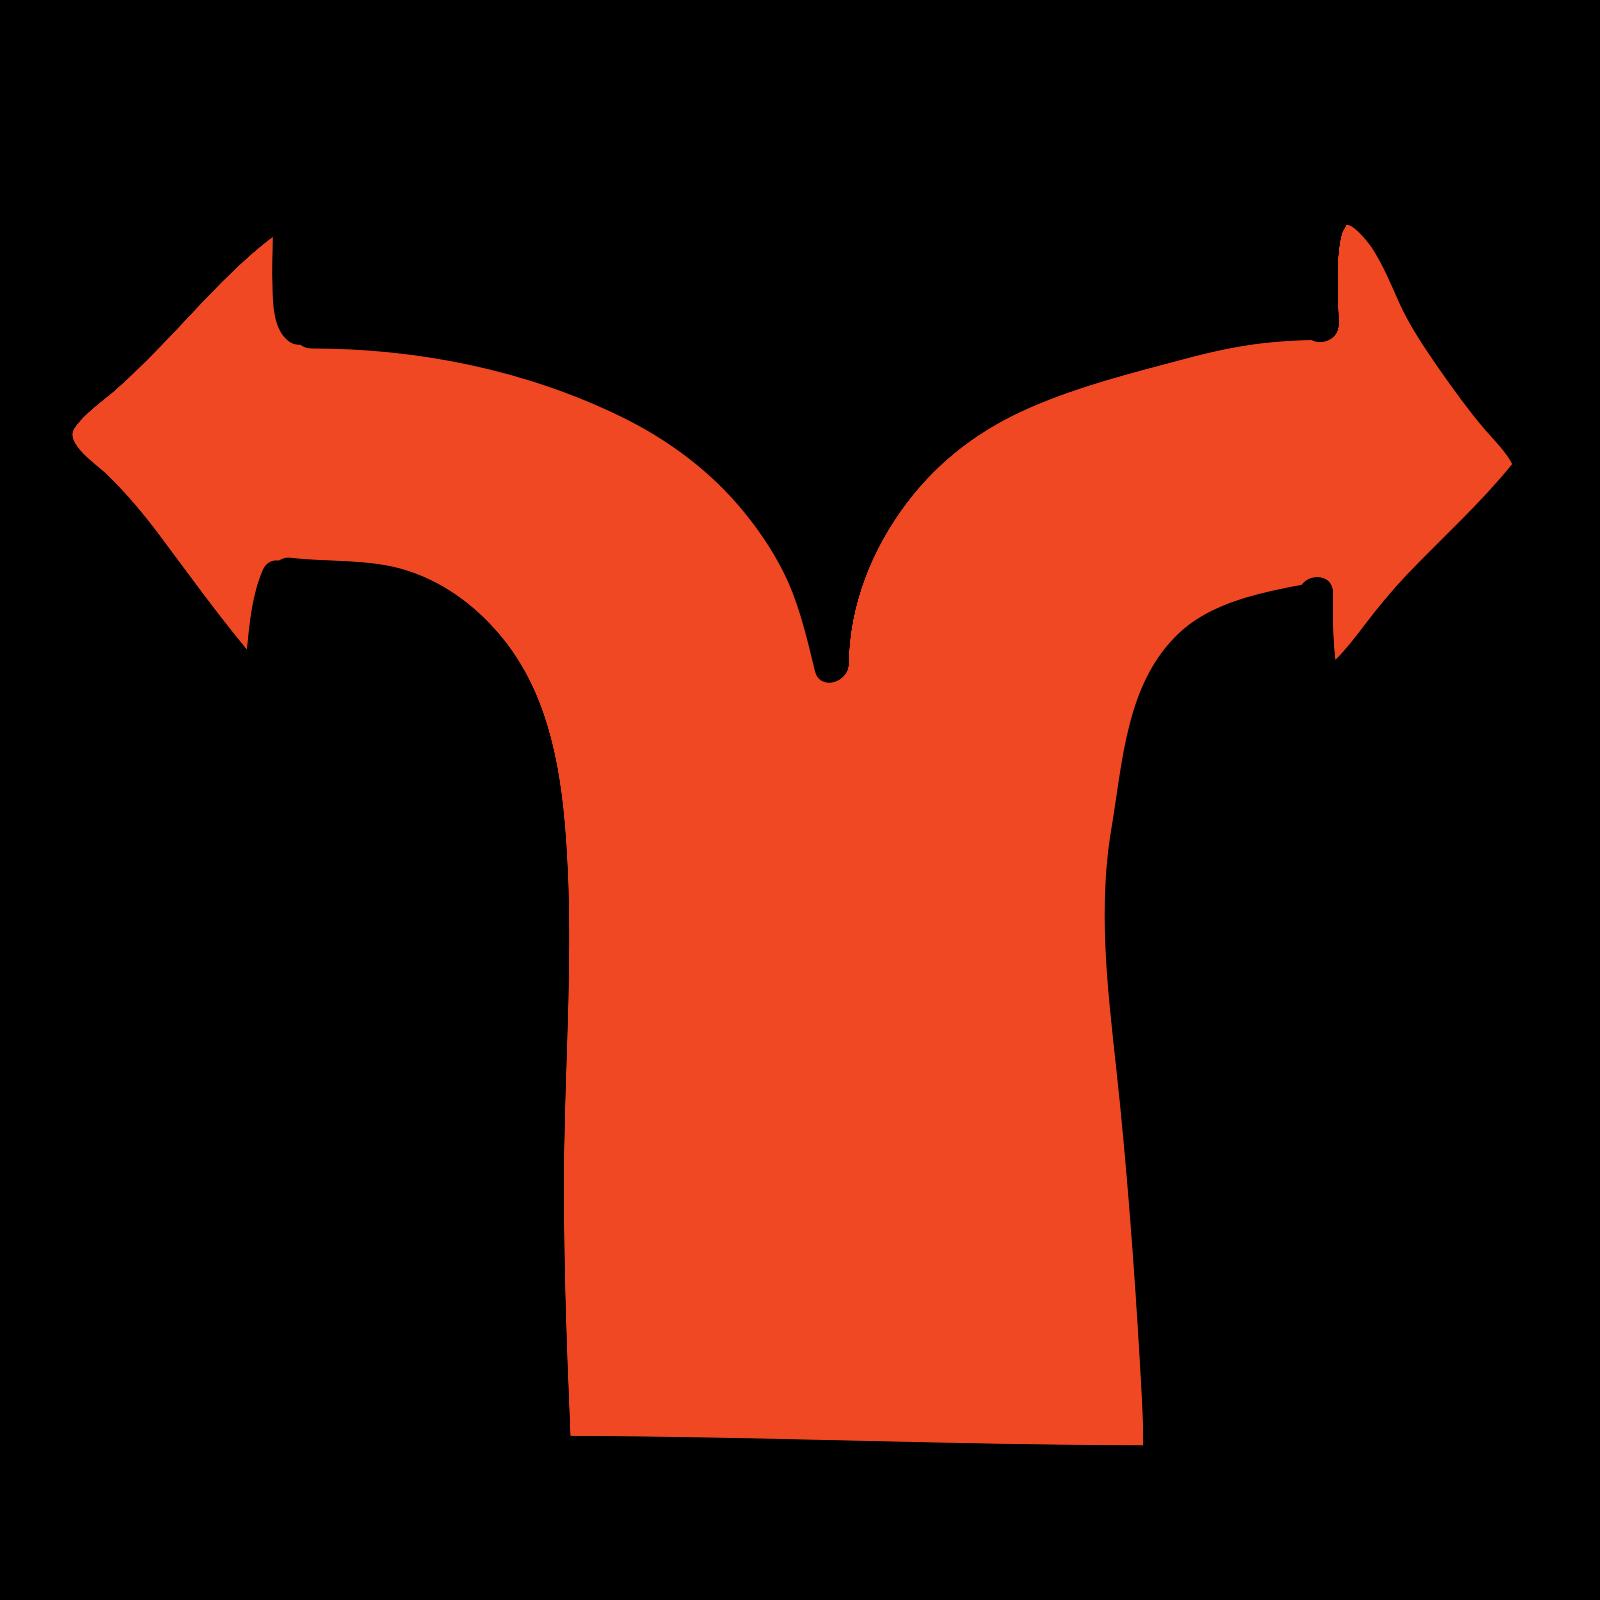 Divarication icon